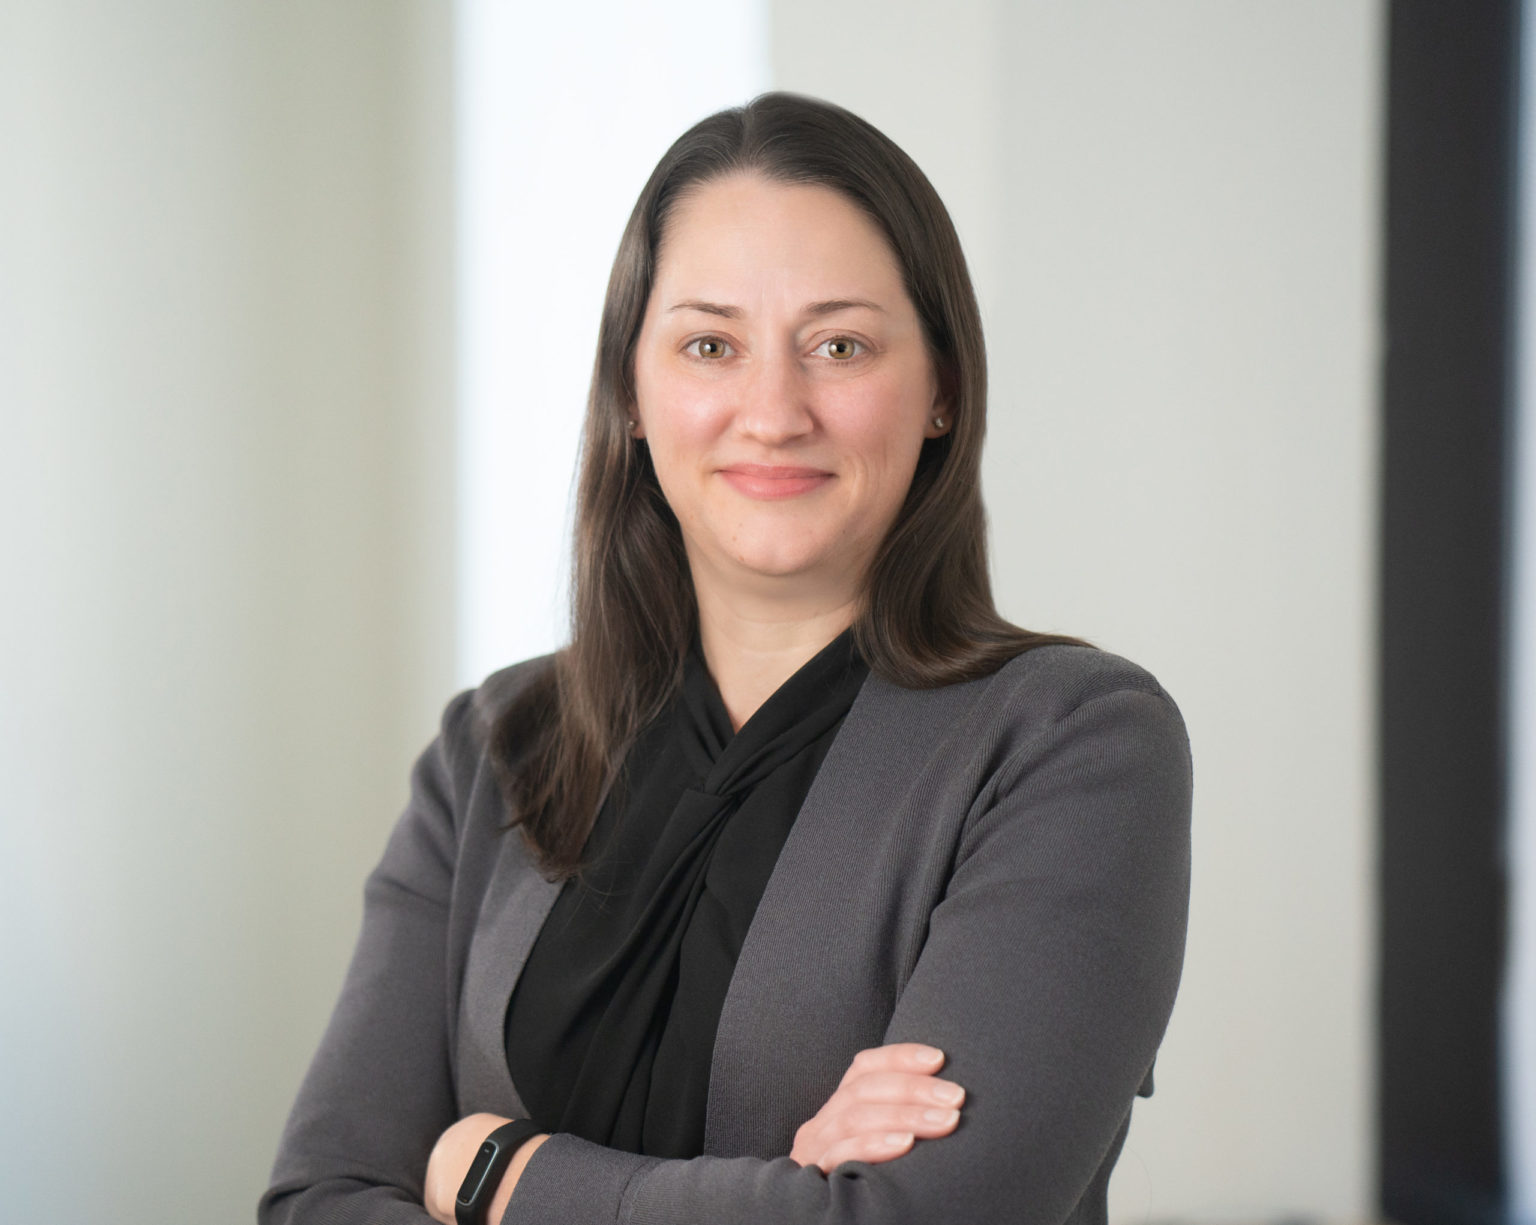 Sarah Emond